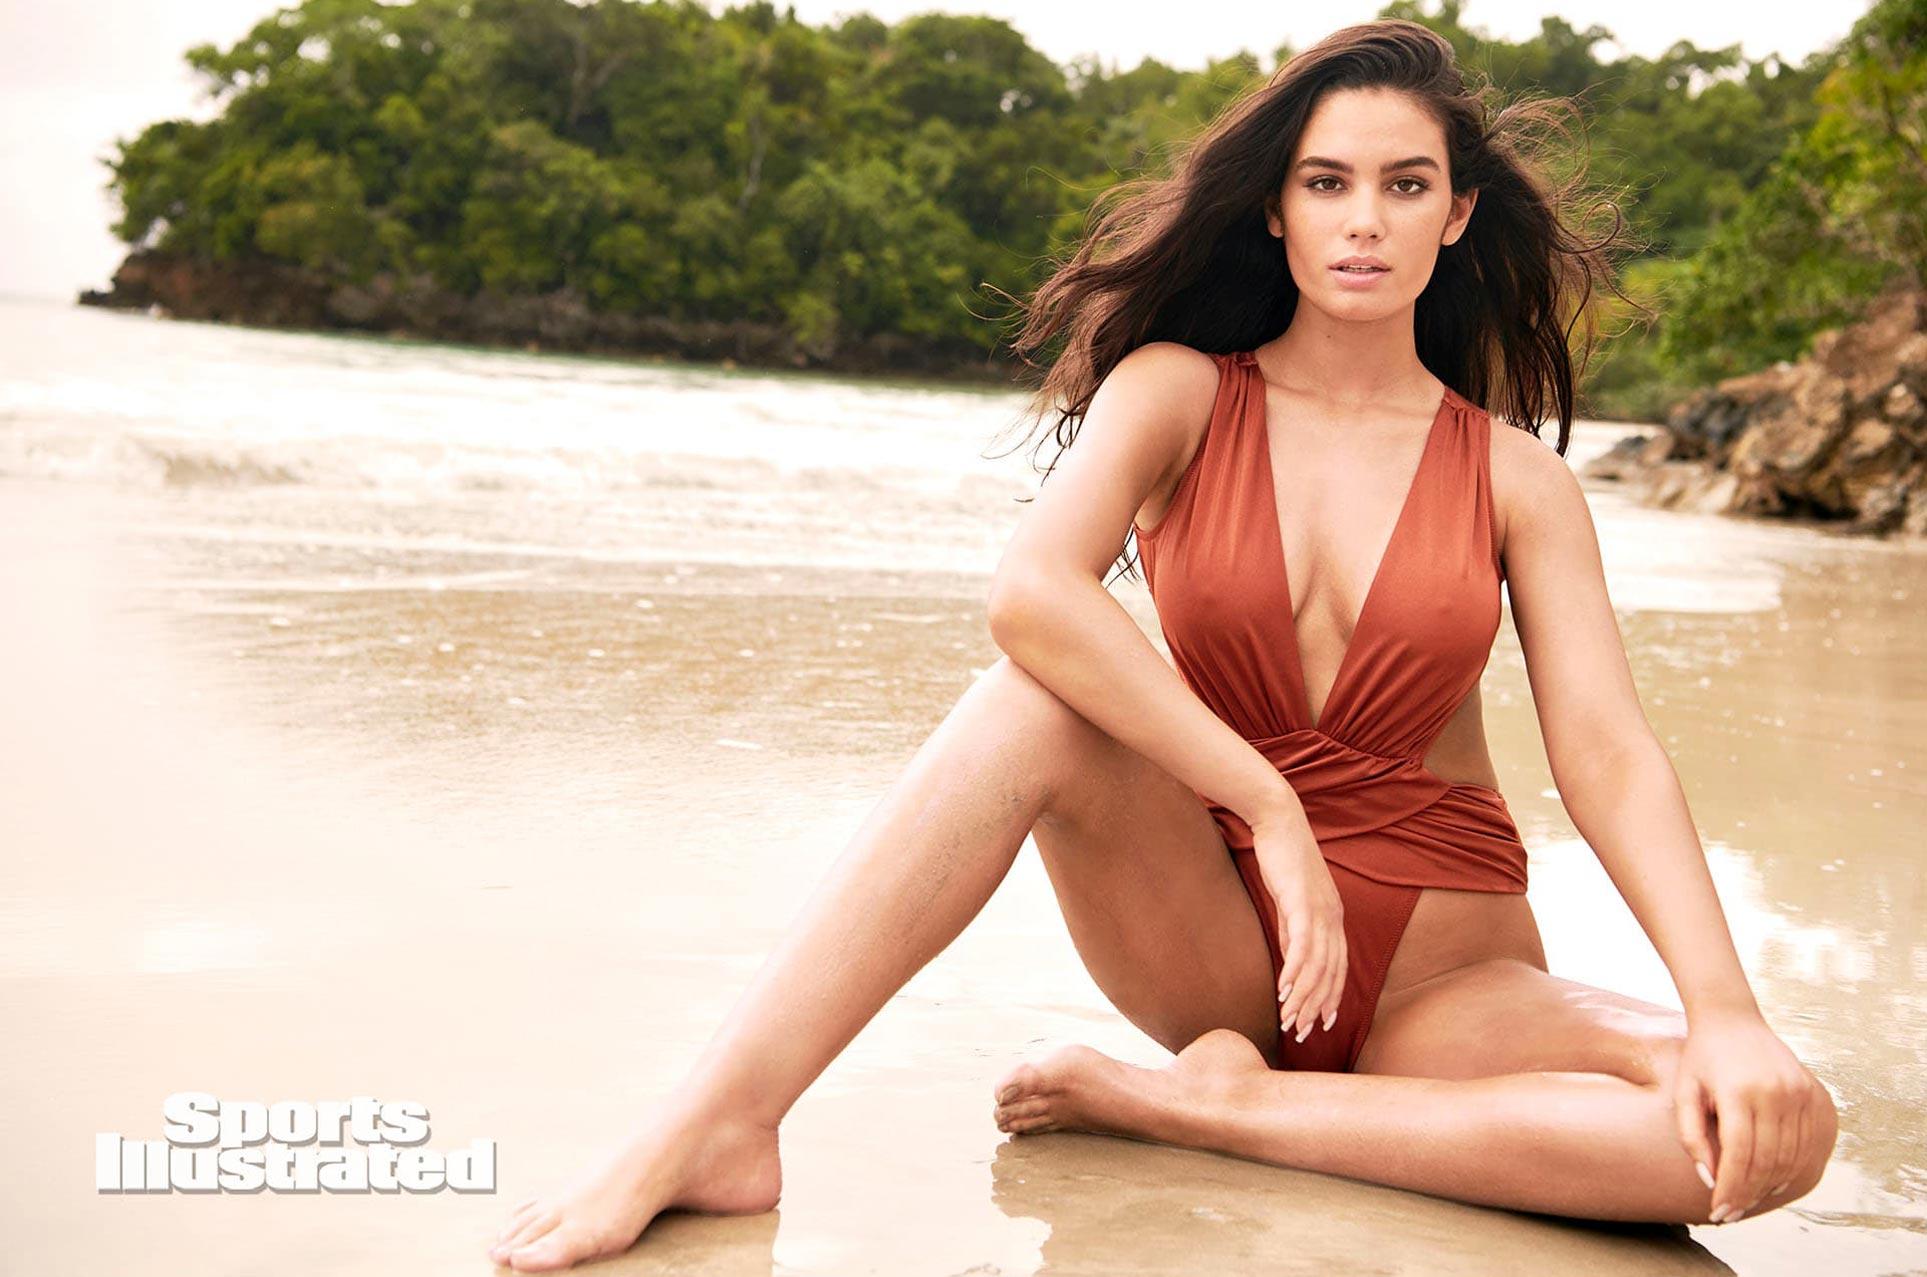 Энн де Паула в каталоге купальников Sports Illustrated Swimsuit 2020 / фото 19